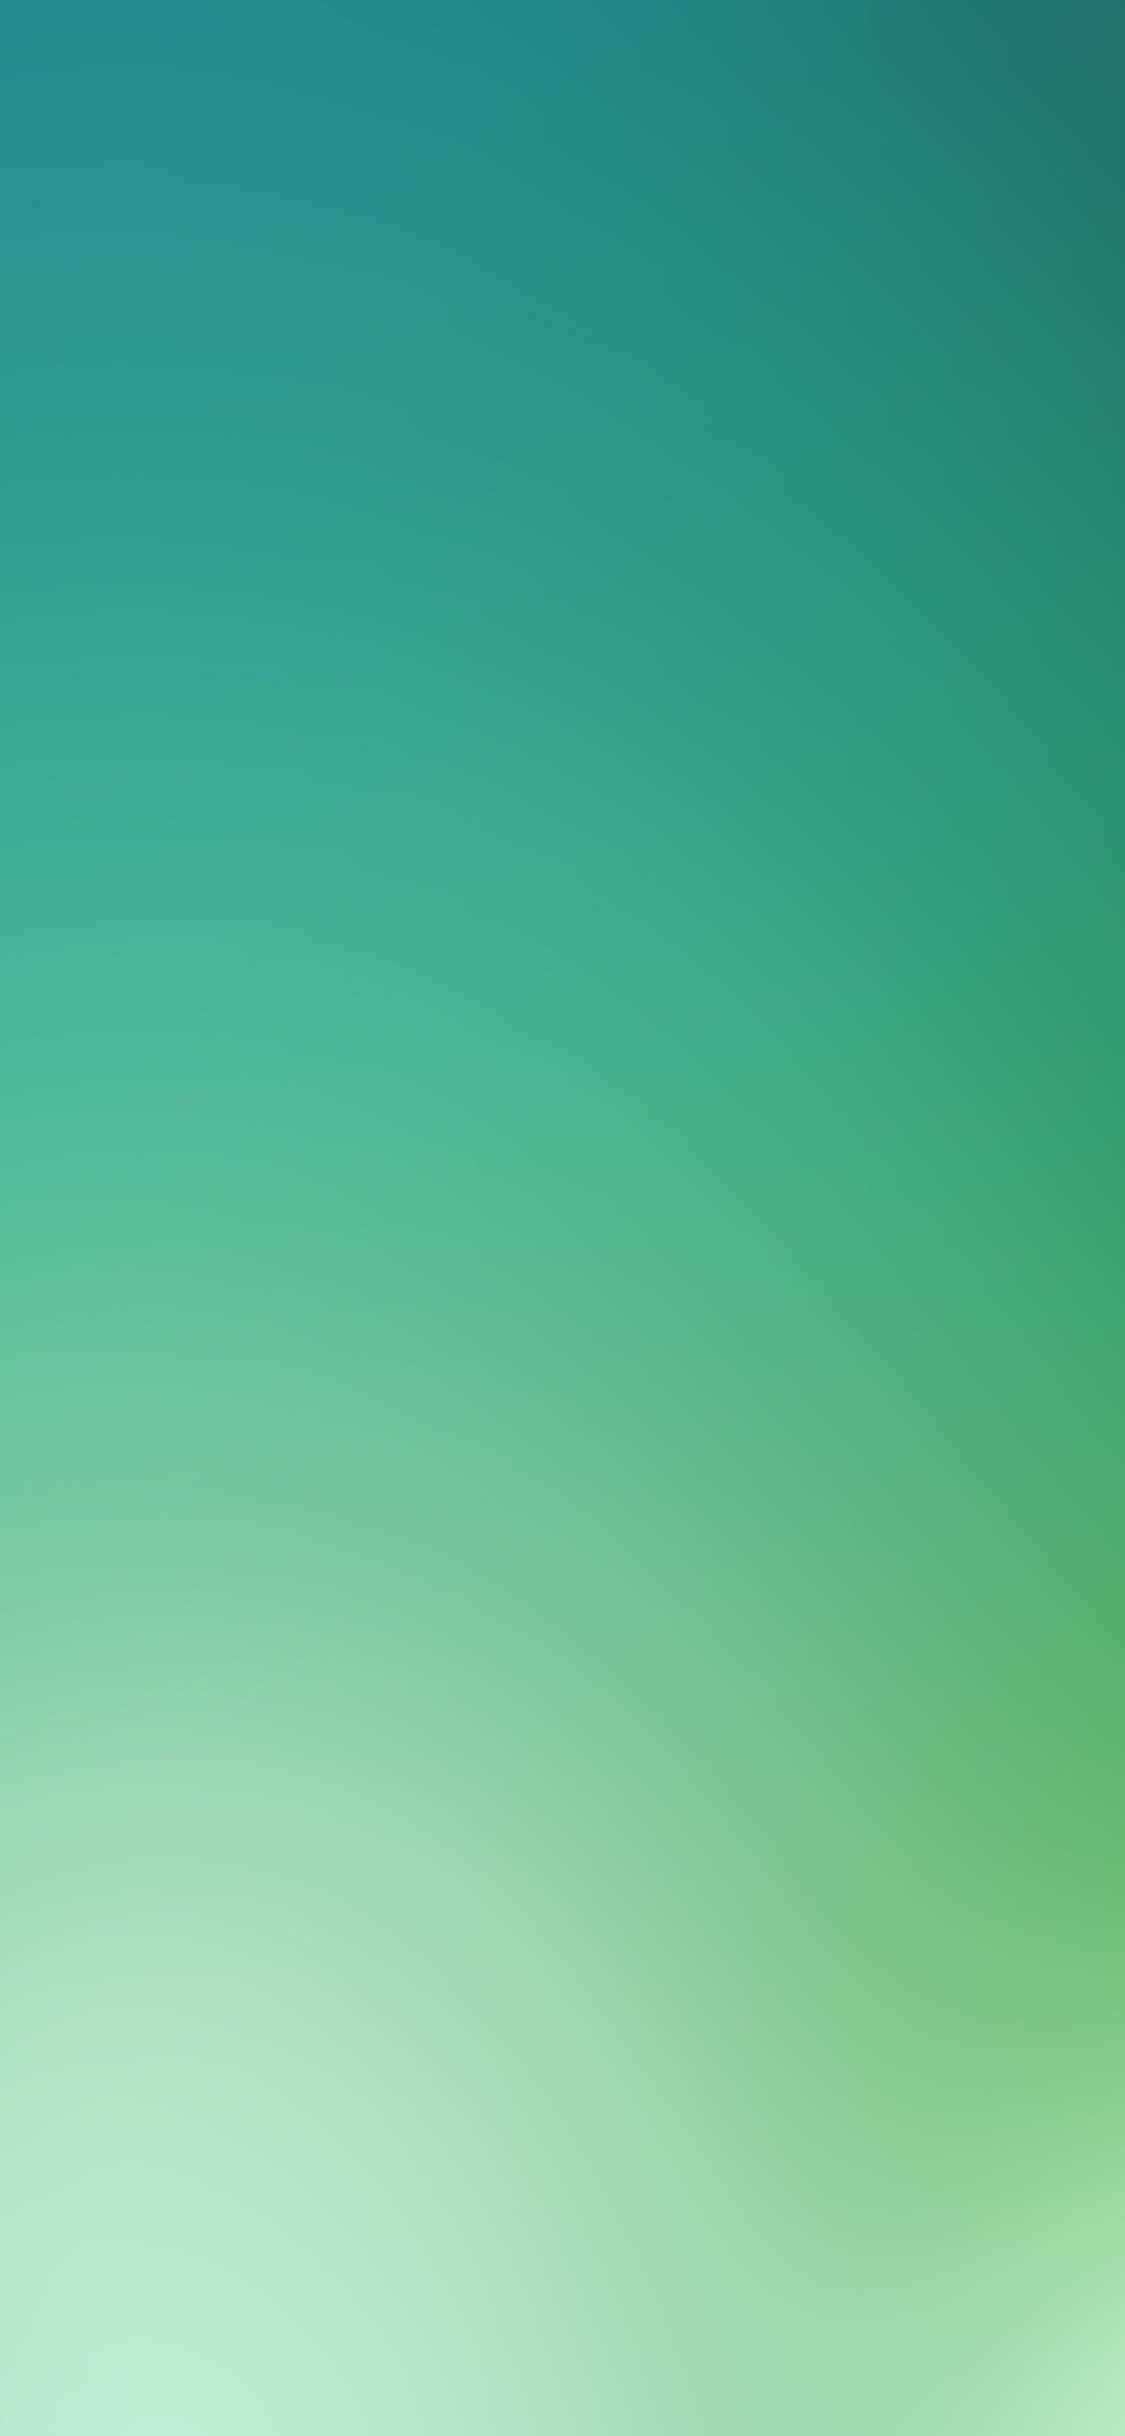 iPhoneXpapers.com-Apple-iPhone-wallpaper-sf77-green-magic-grass-peace-gradation-blur